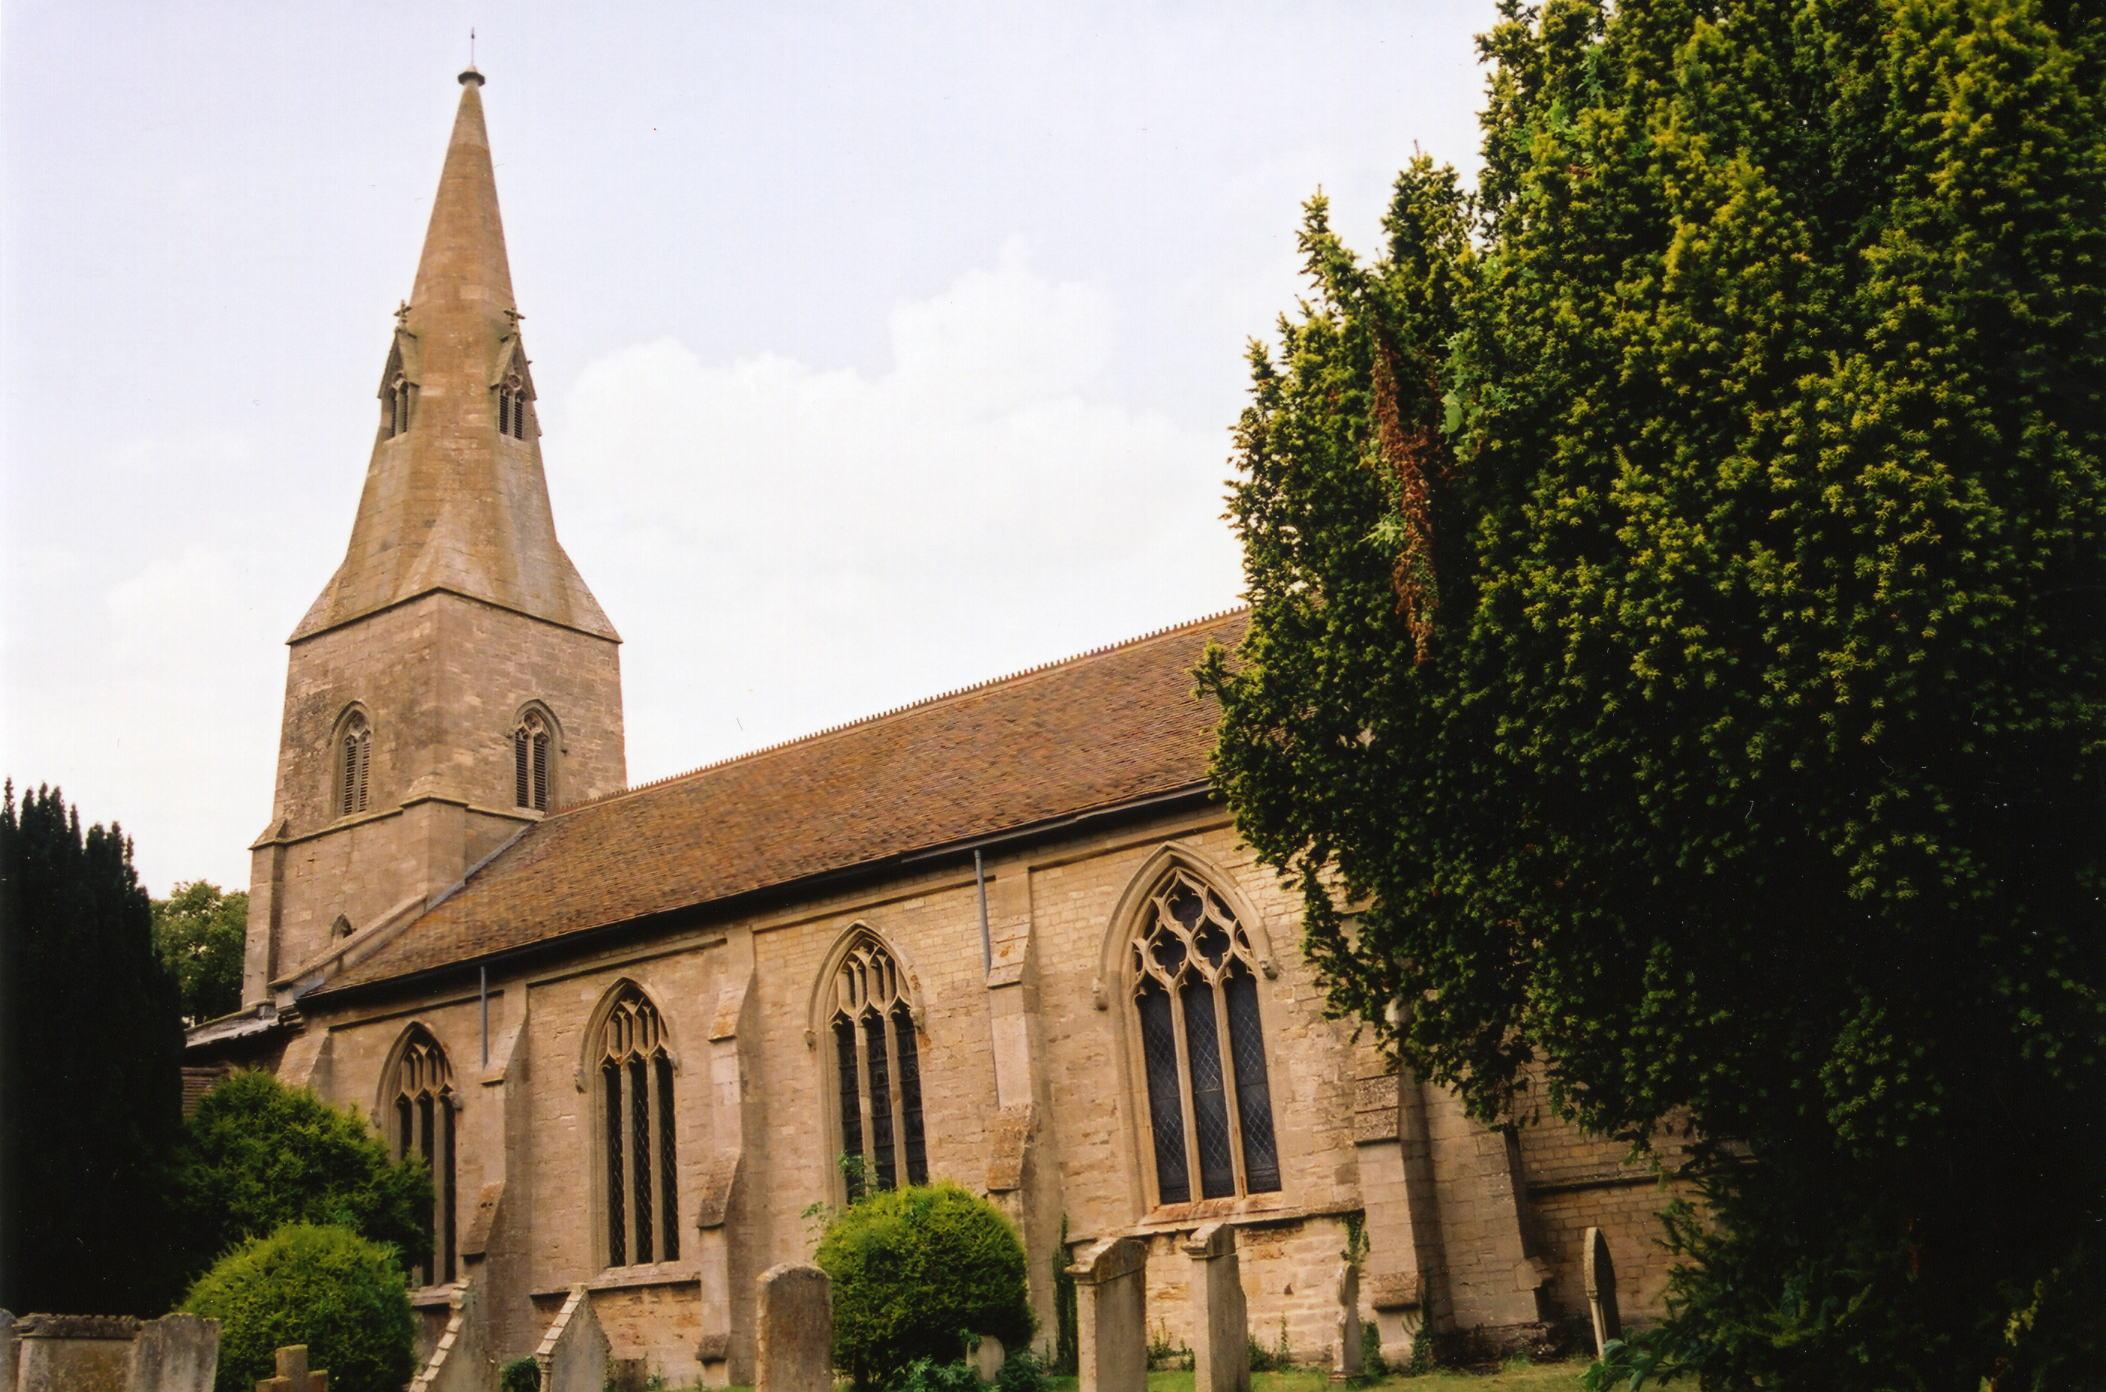 Braceborough St. Margaret parish church